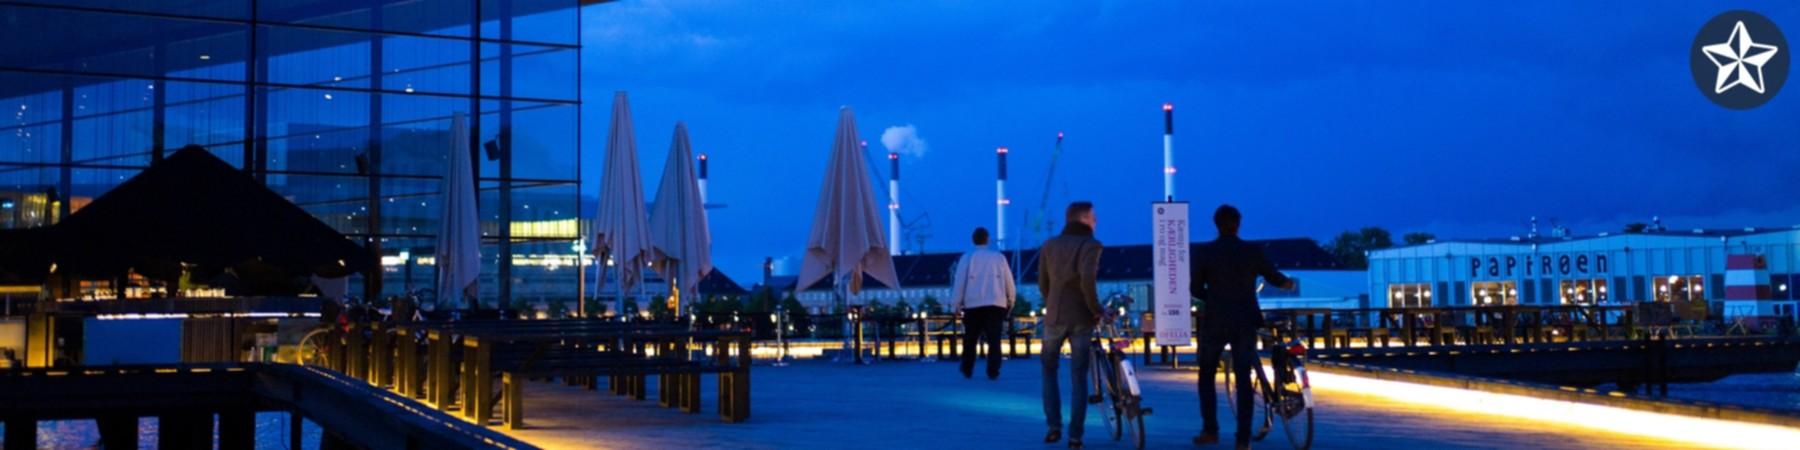 Copenhagen Banner.jpg